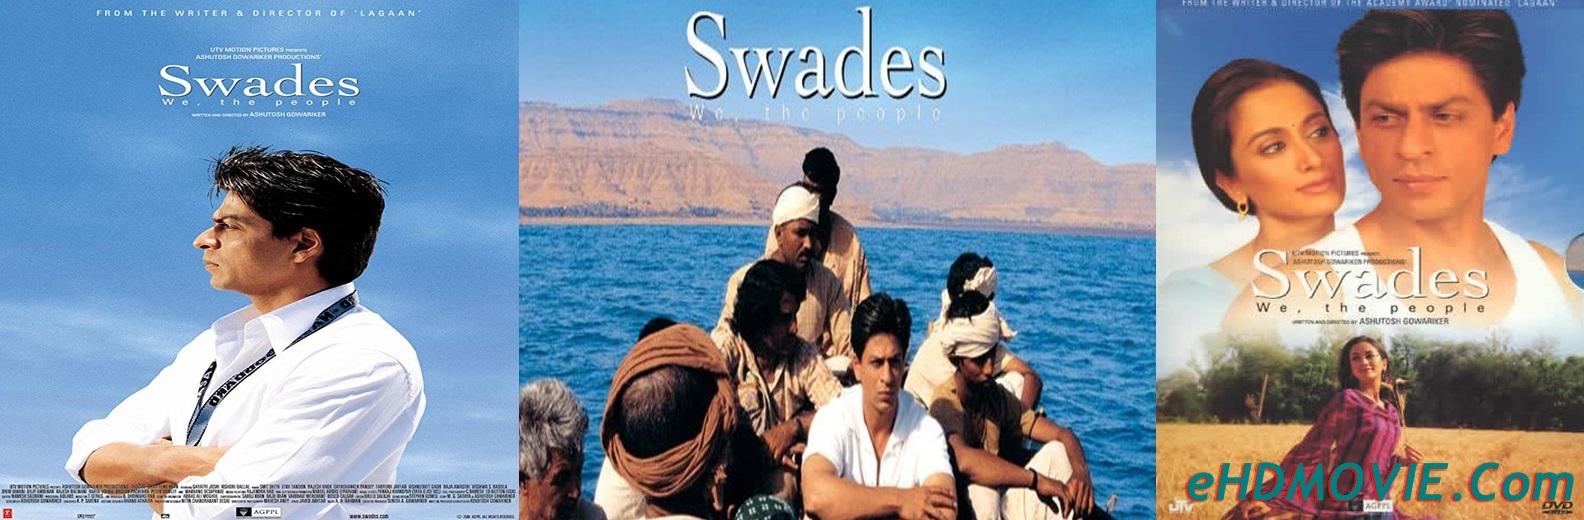 Swades 2004 Full Movie Hindi 720p 480p Org Brrip 750mb 1 5gb Esubs Free Download 5xbd Com